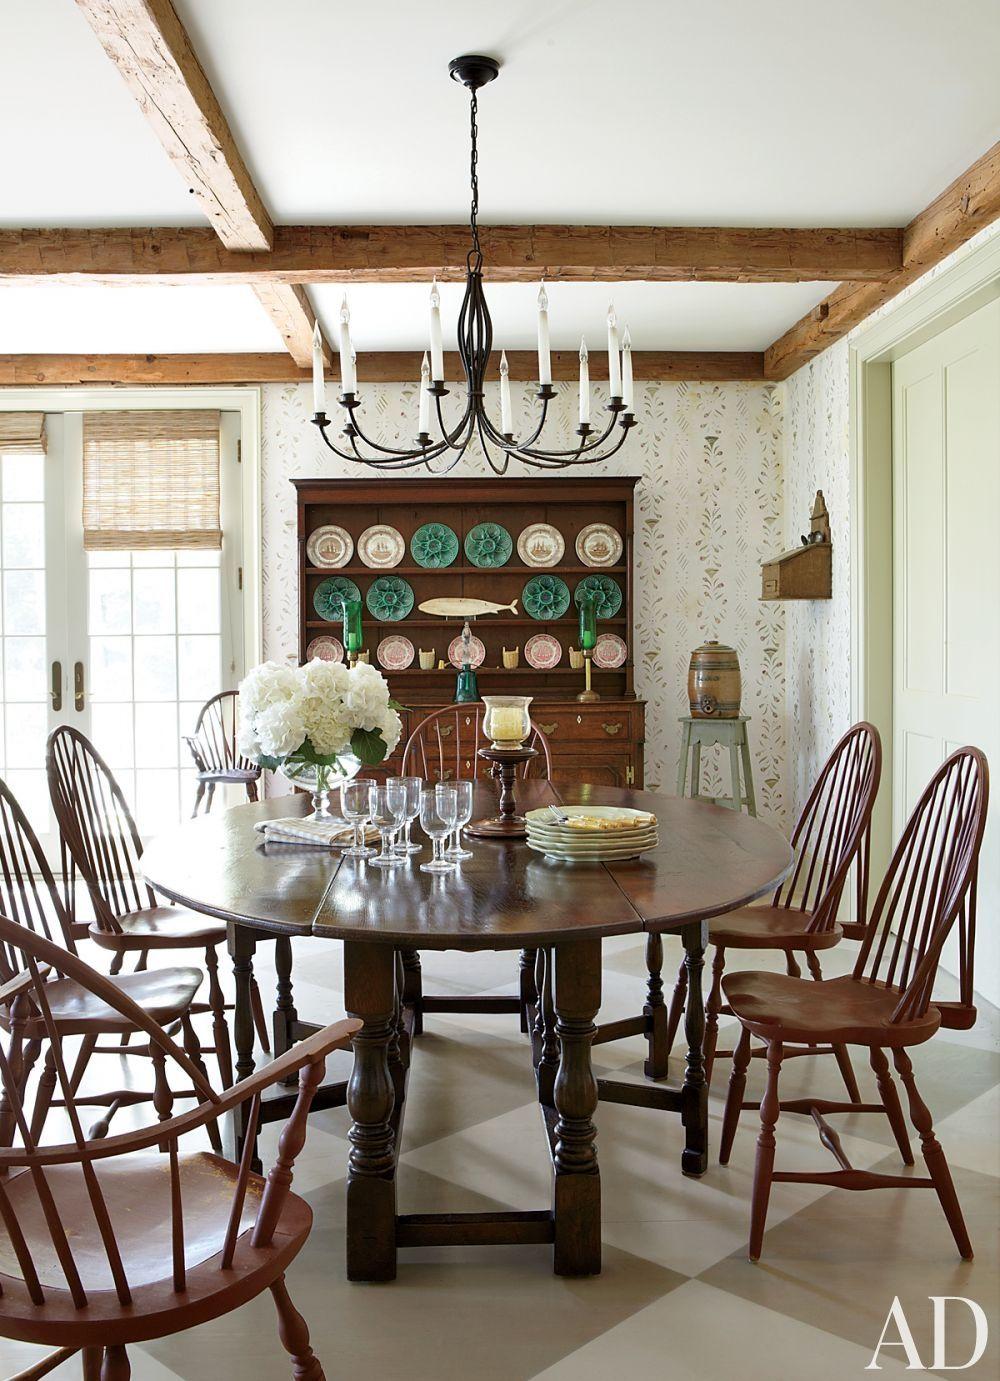 Colonial dining | I Love Interior Design! | Pinterest